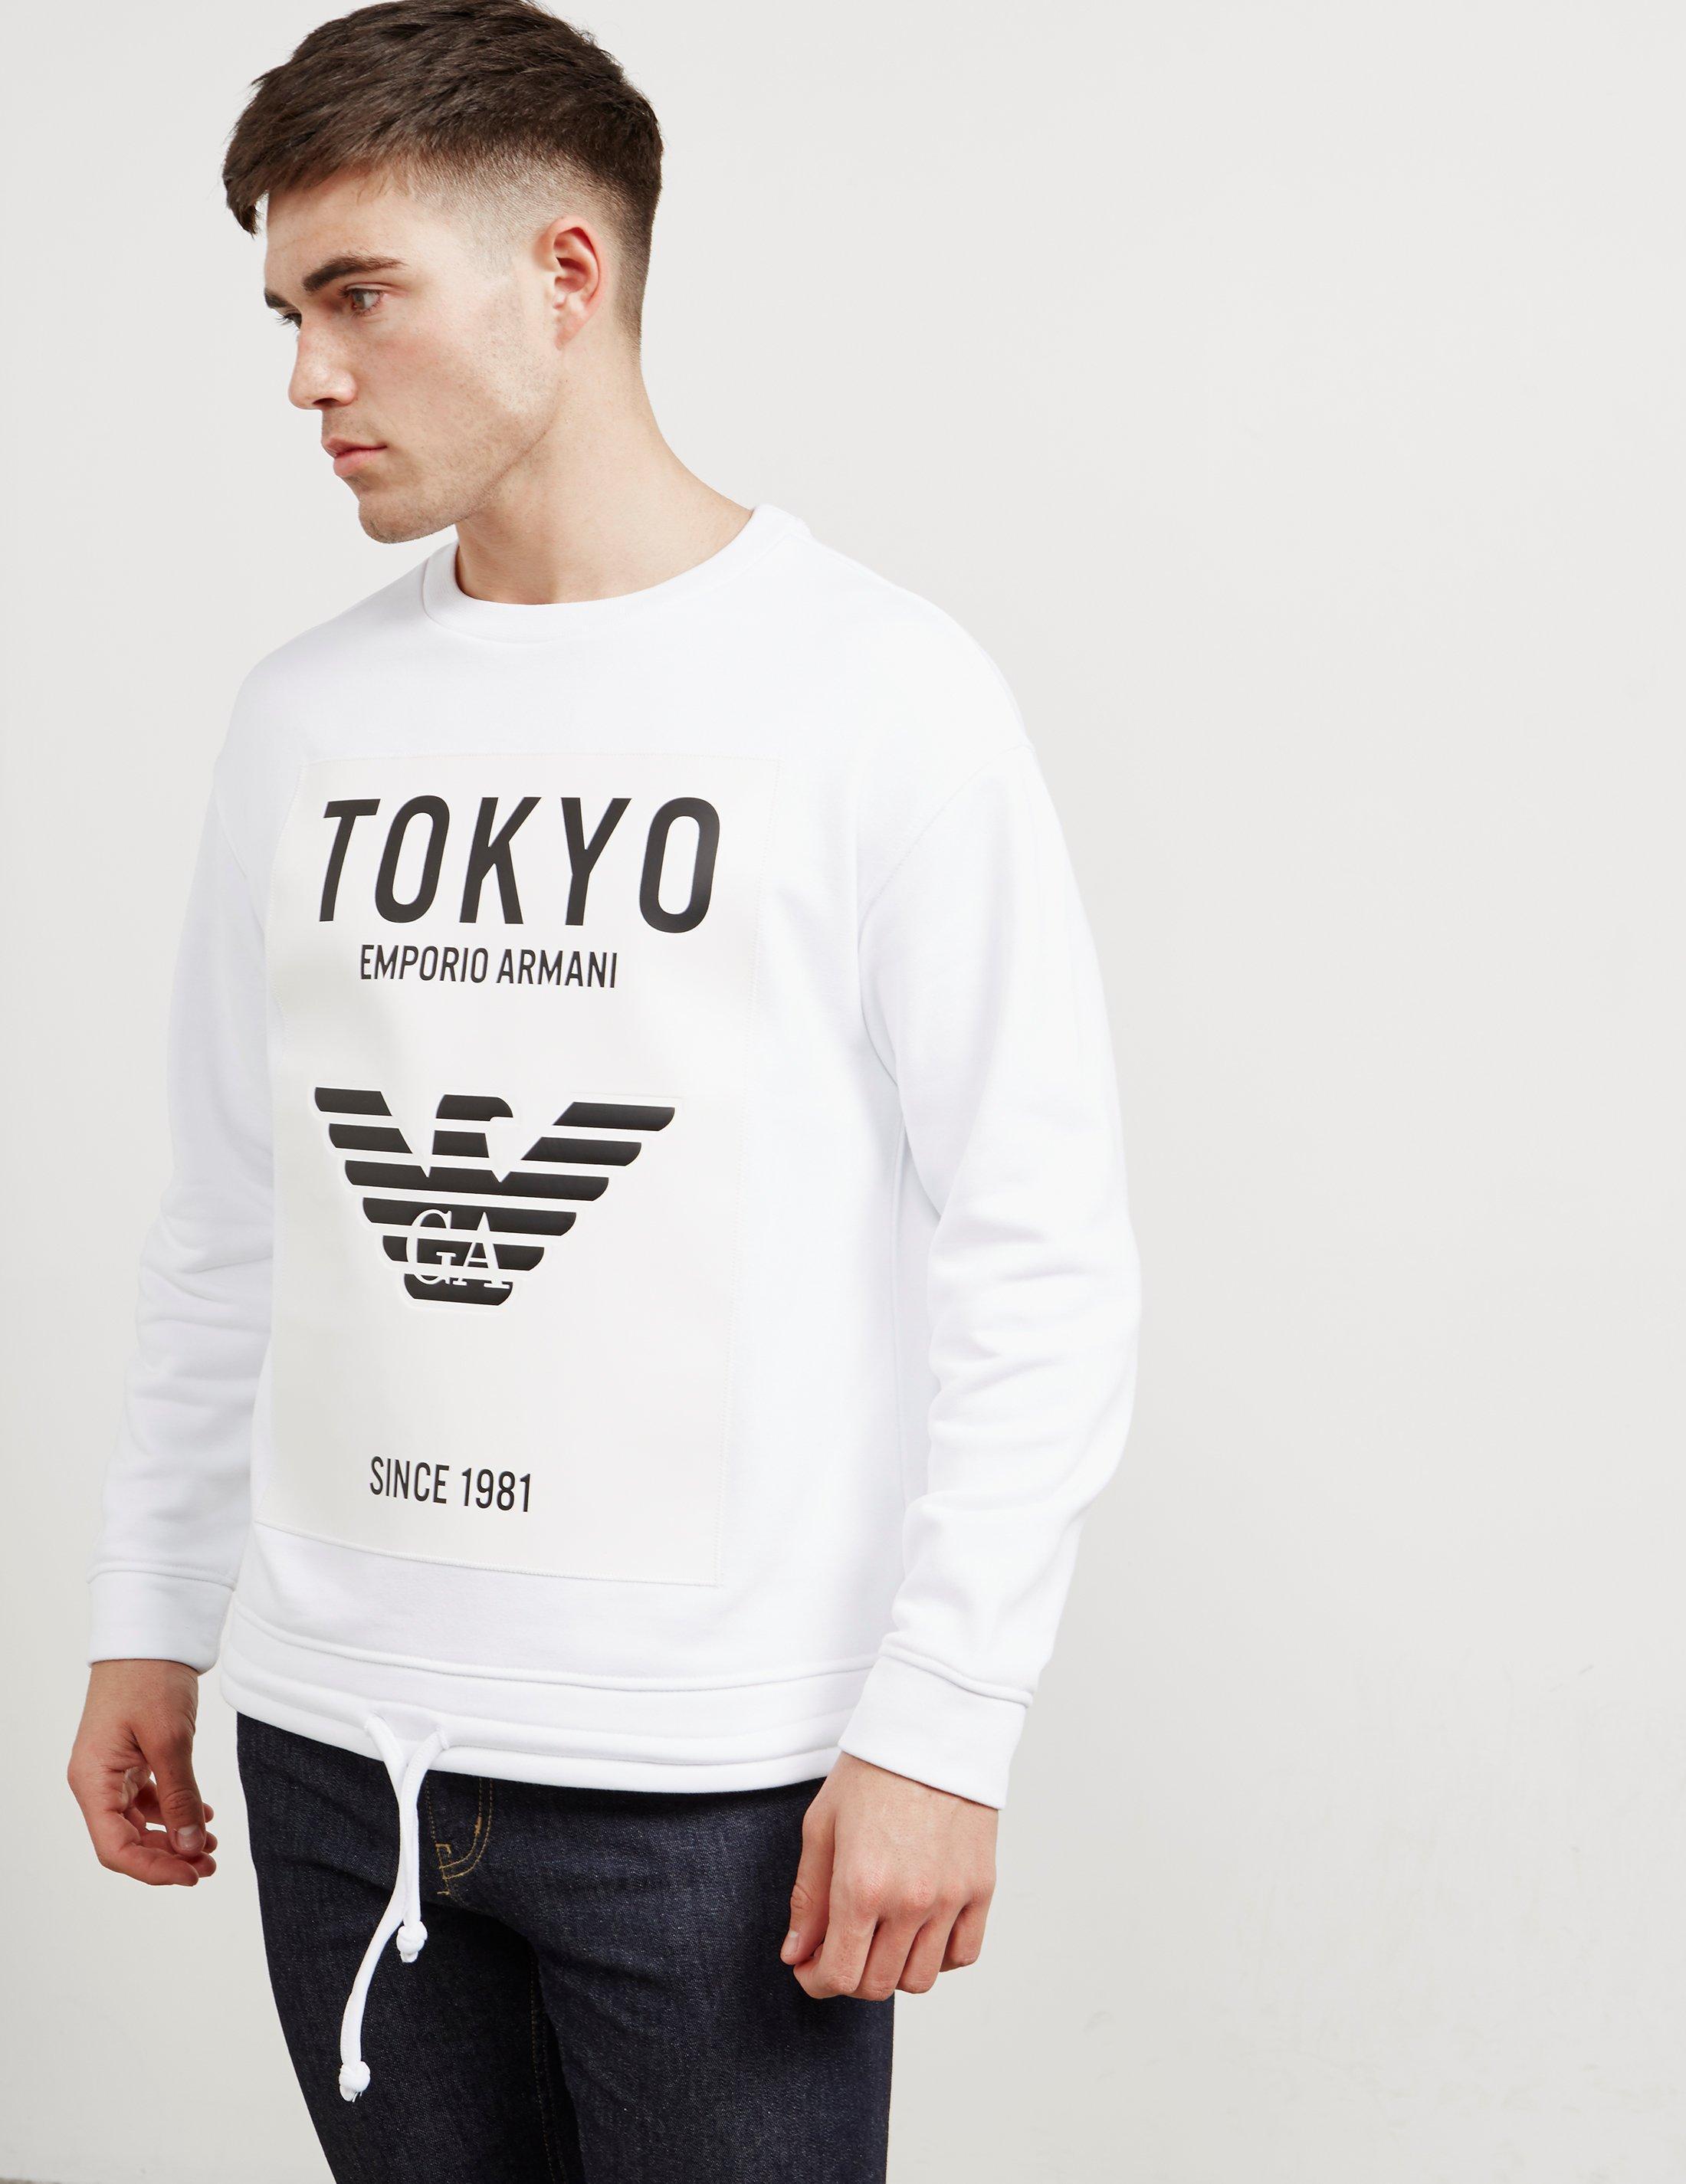 Online Tokyo Mens White In Sweatshirt Exclusive Emporio Armani 7gaqaI